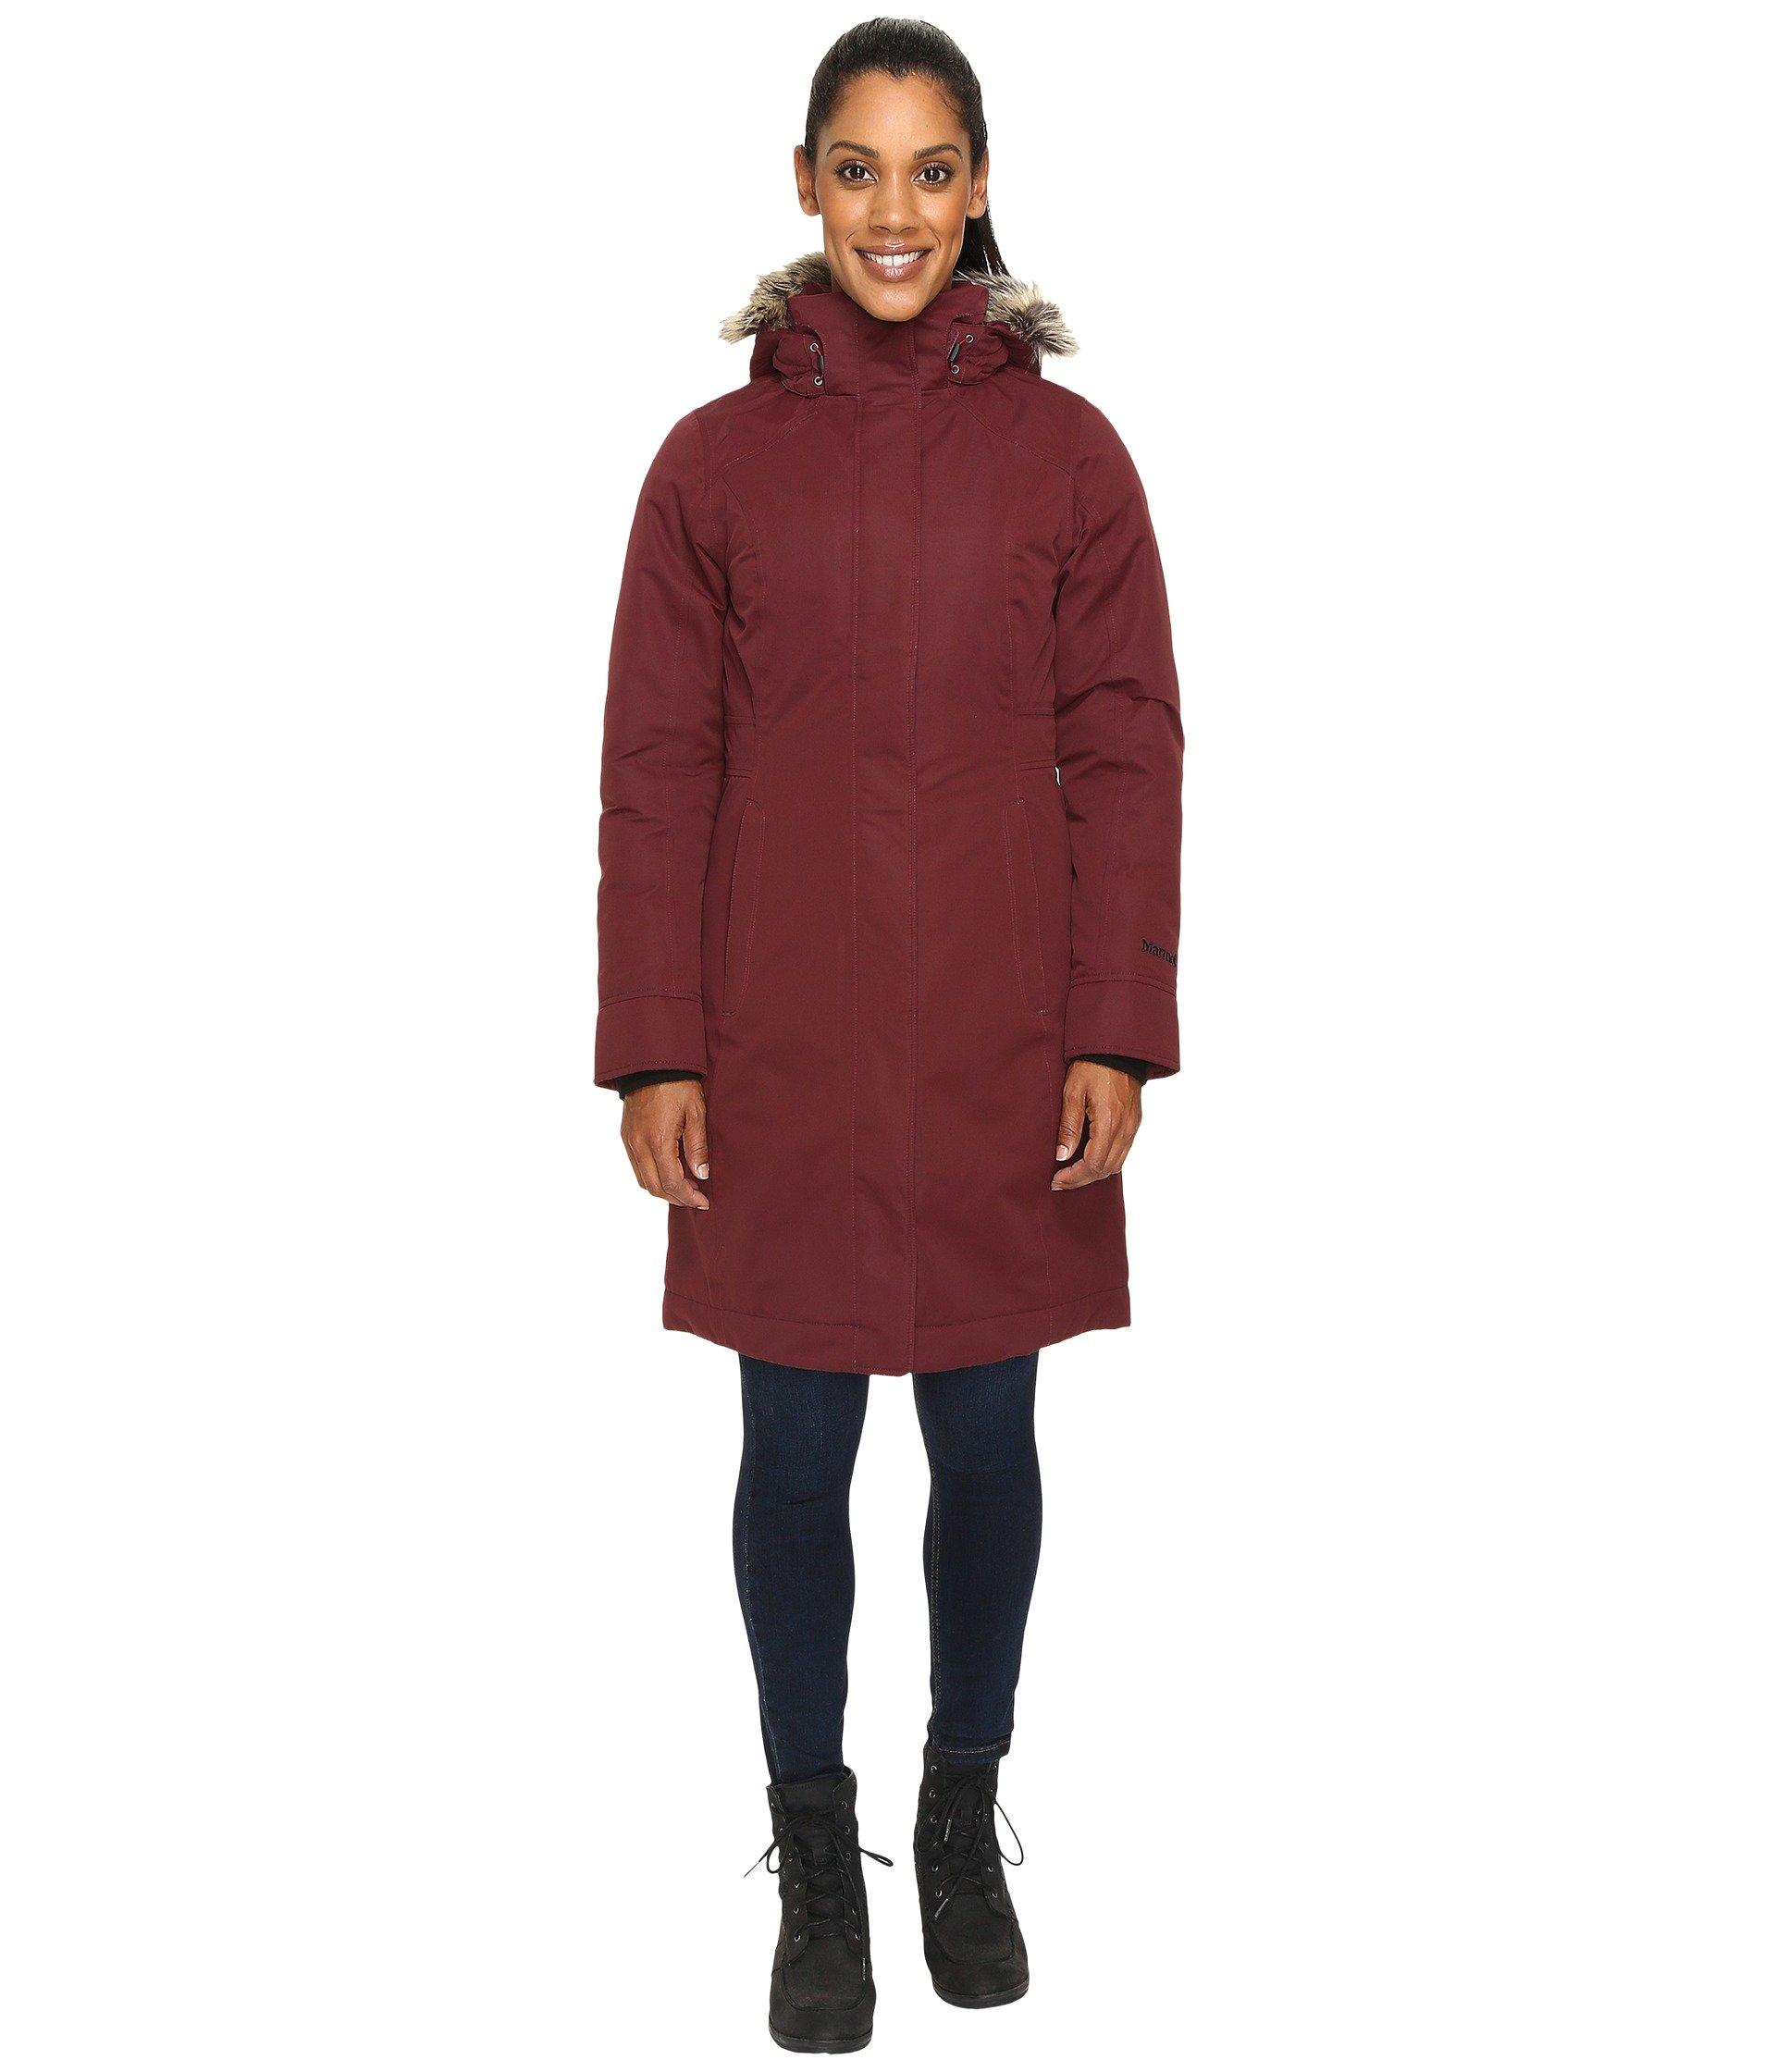 Marmot Chelsea Down Coat for Women, 76560 (X-Large, Port Royal)